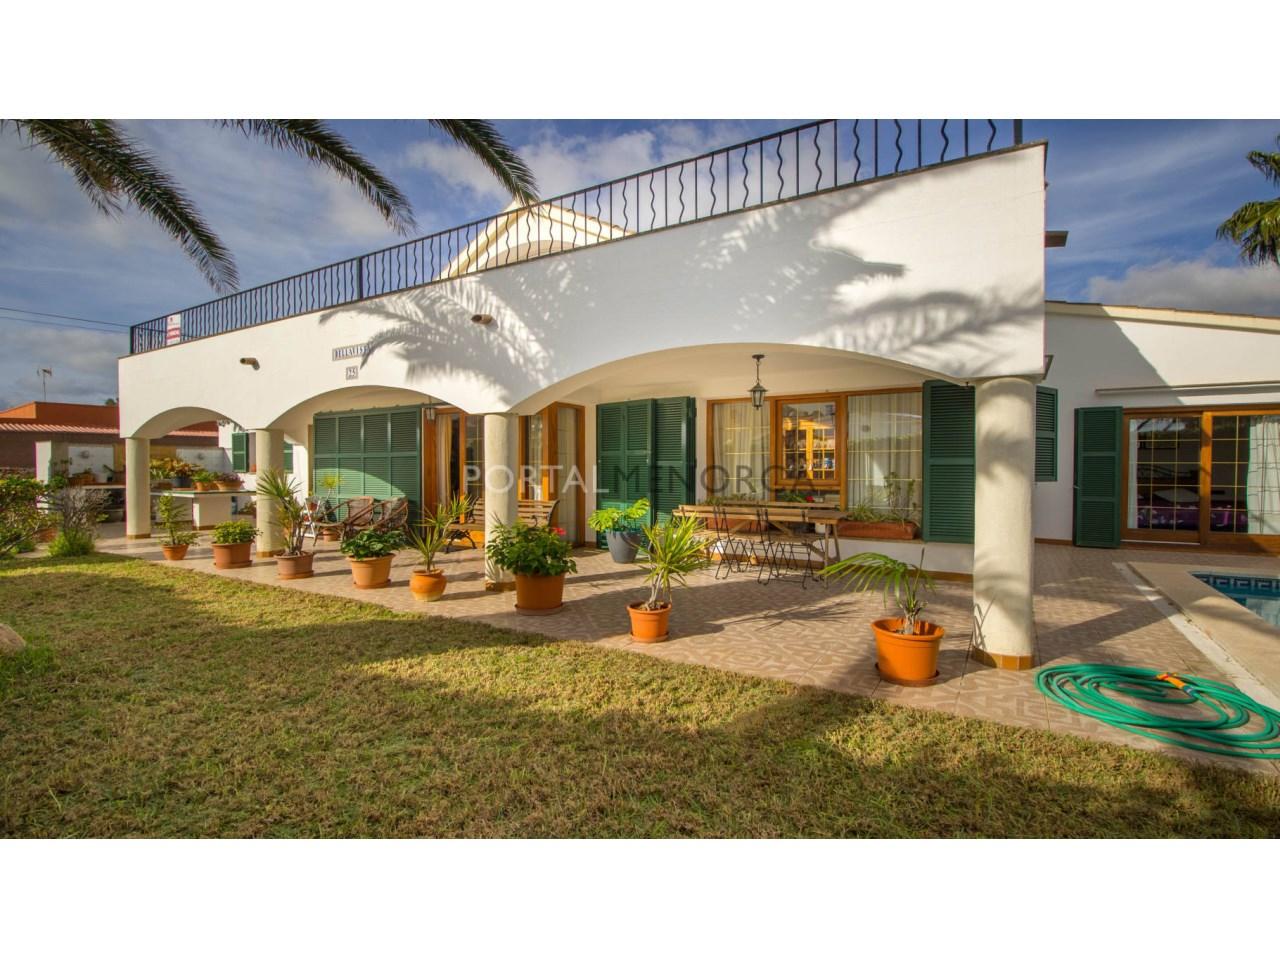 Villa with swimming pool for sale in Menorca